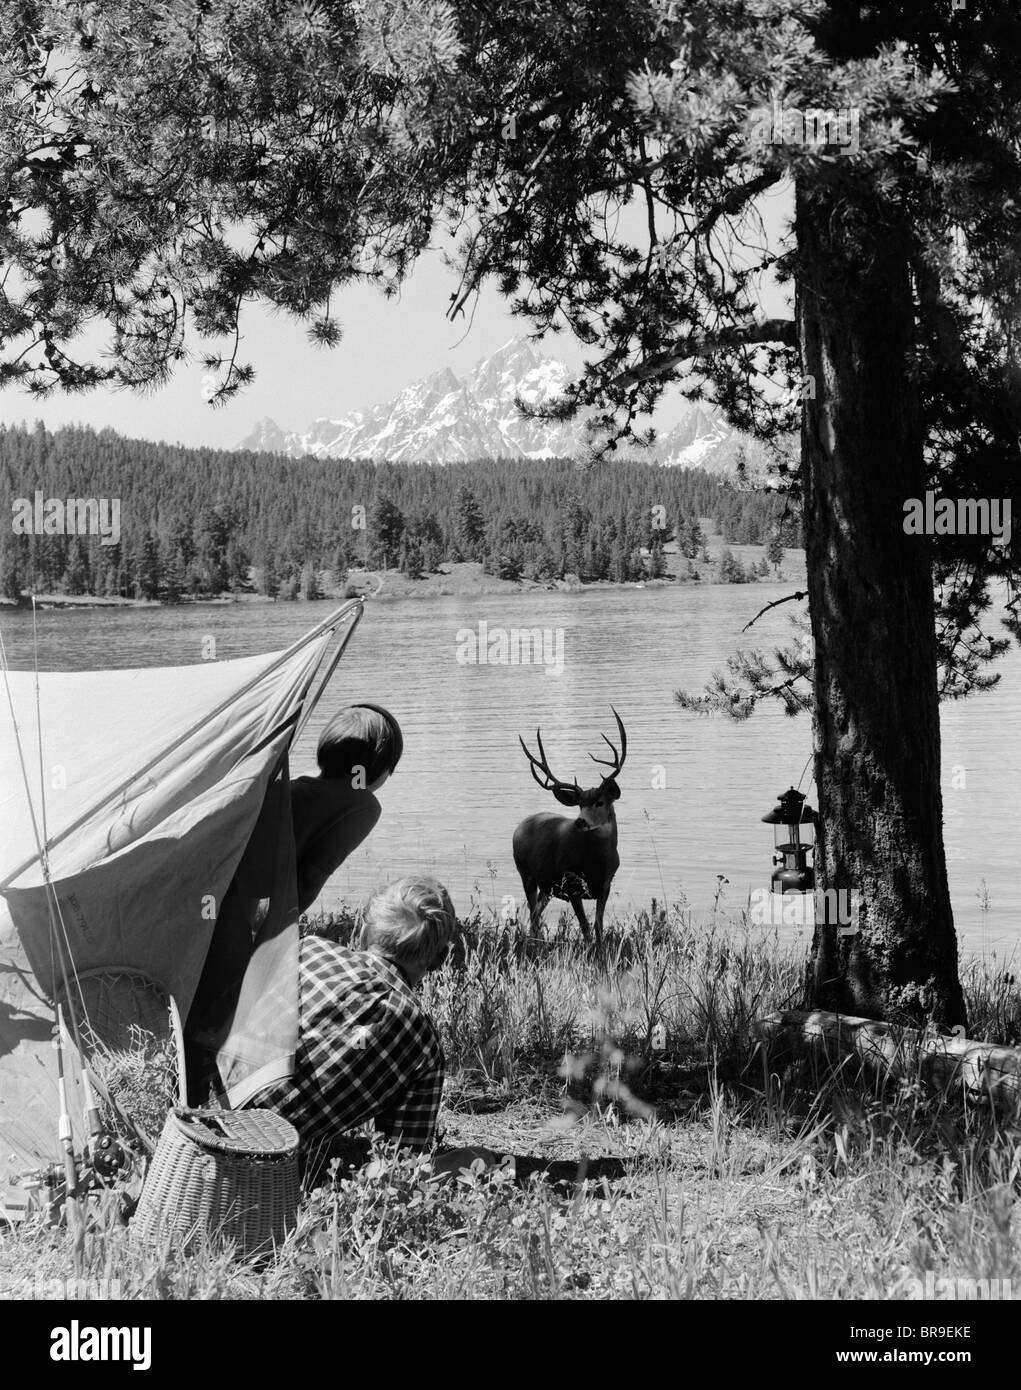 1960s CAMPERS AT GRAND TETON NATIONAL PARK WYOMING SPOTTING BUCK AT LAKESIDE - Stock Image